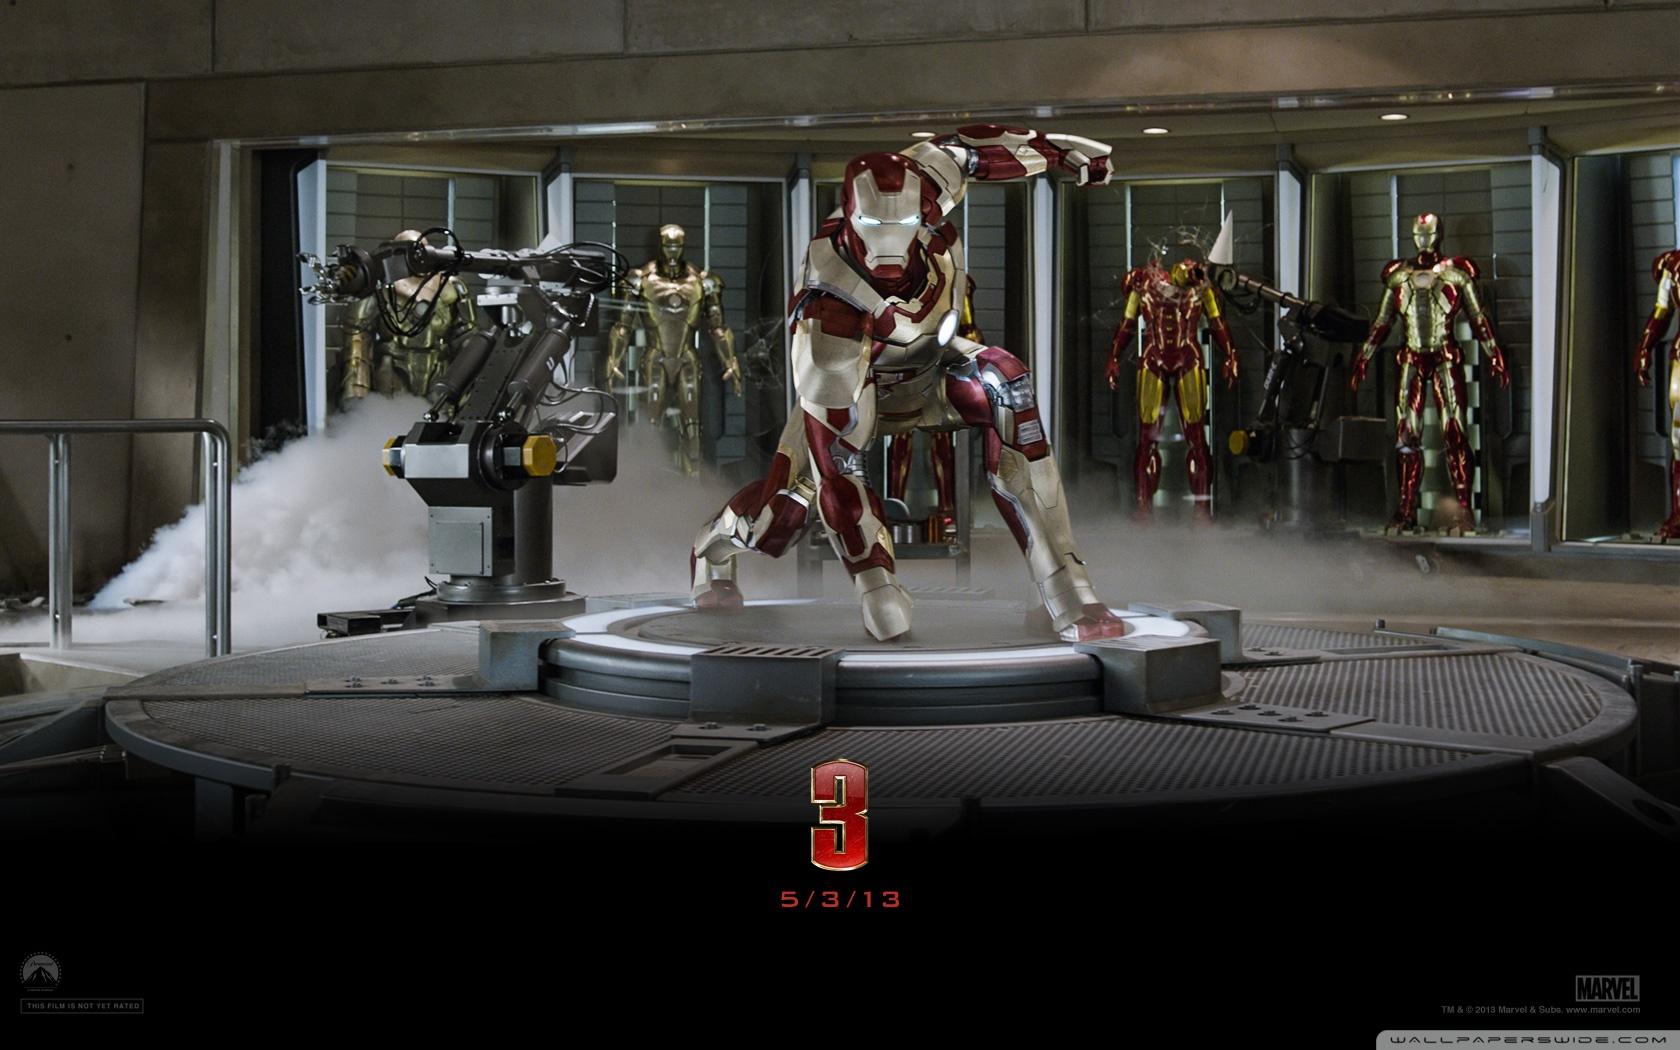 Iron man 3 suit up 4k hd desktop wallpaper for 4k ultra hd tv wide 53 voltagebd Gallery